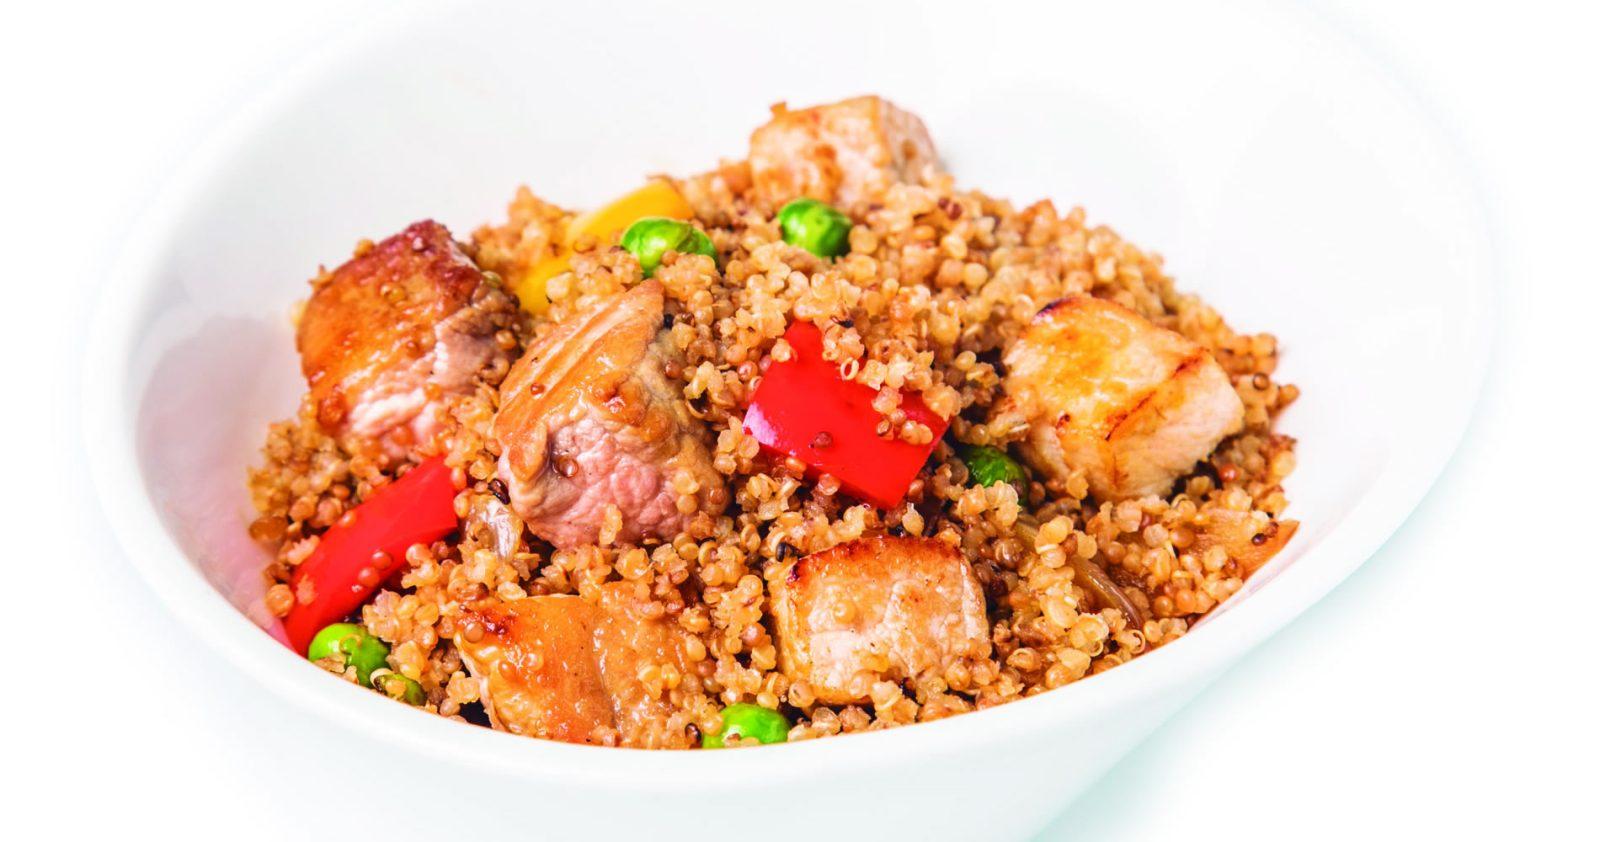 Chaufa De Solomito De Cerdo Y Quinoa